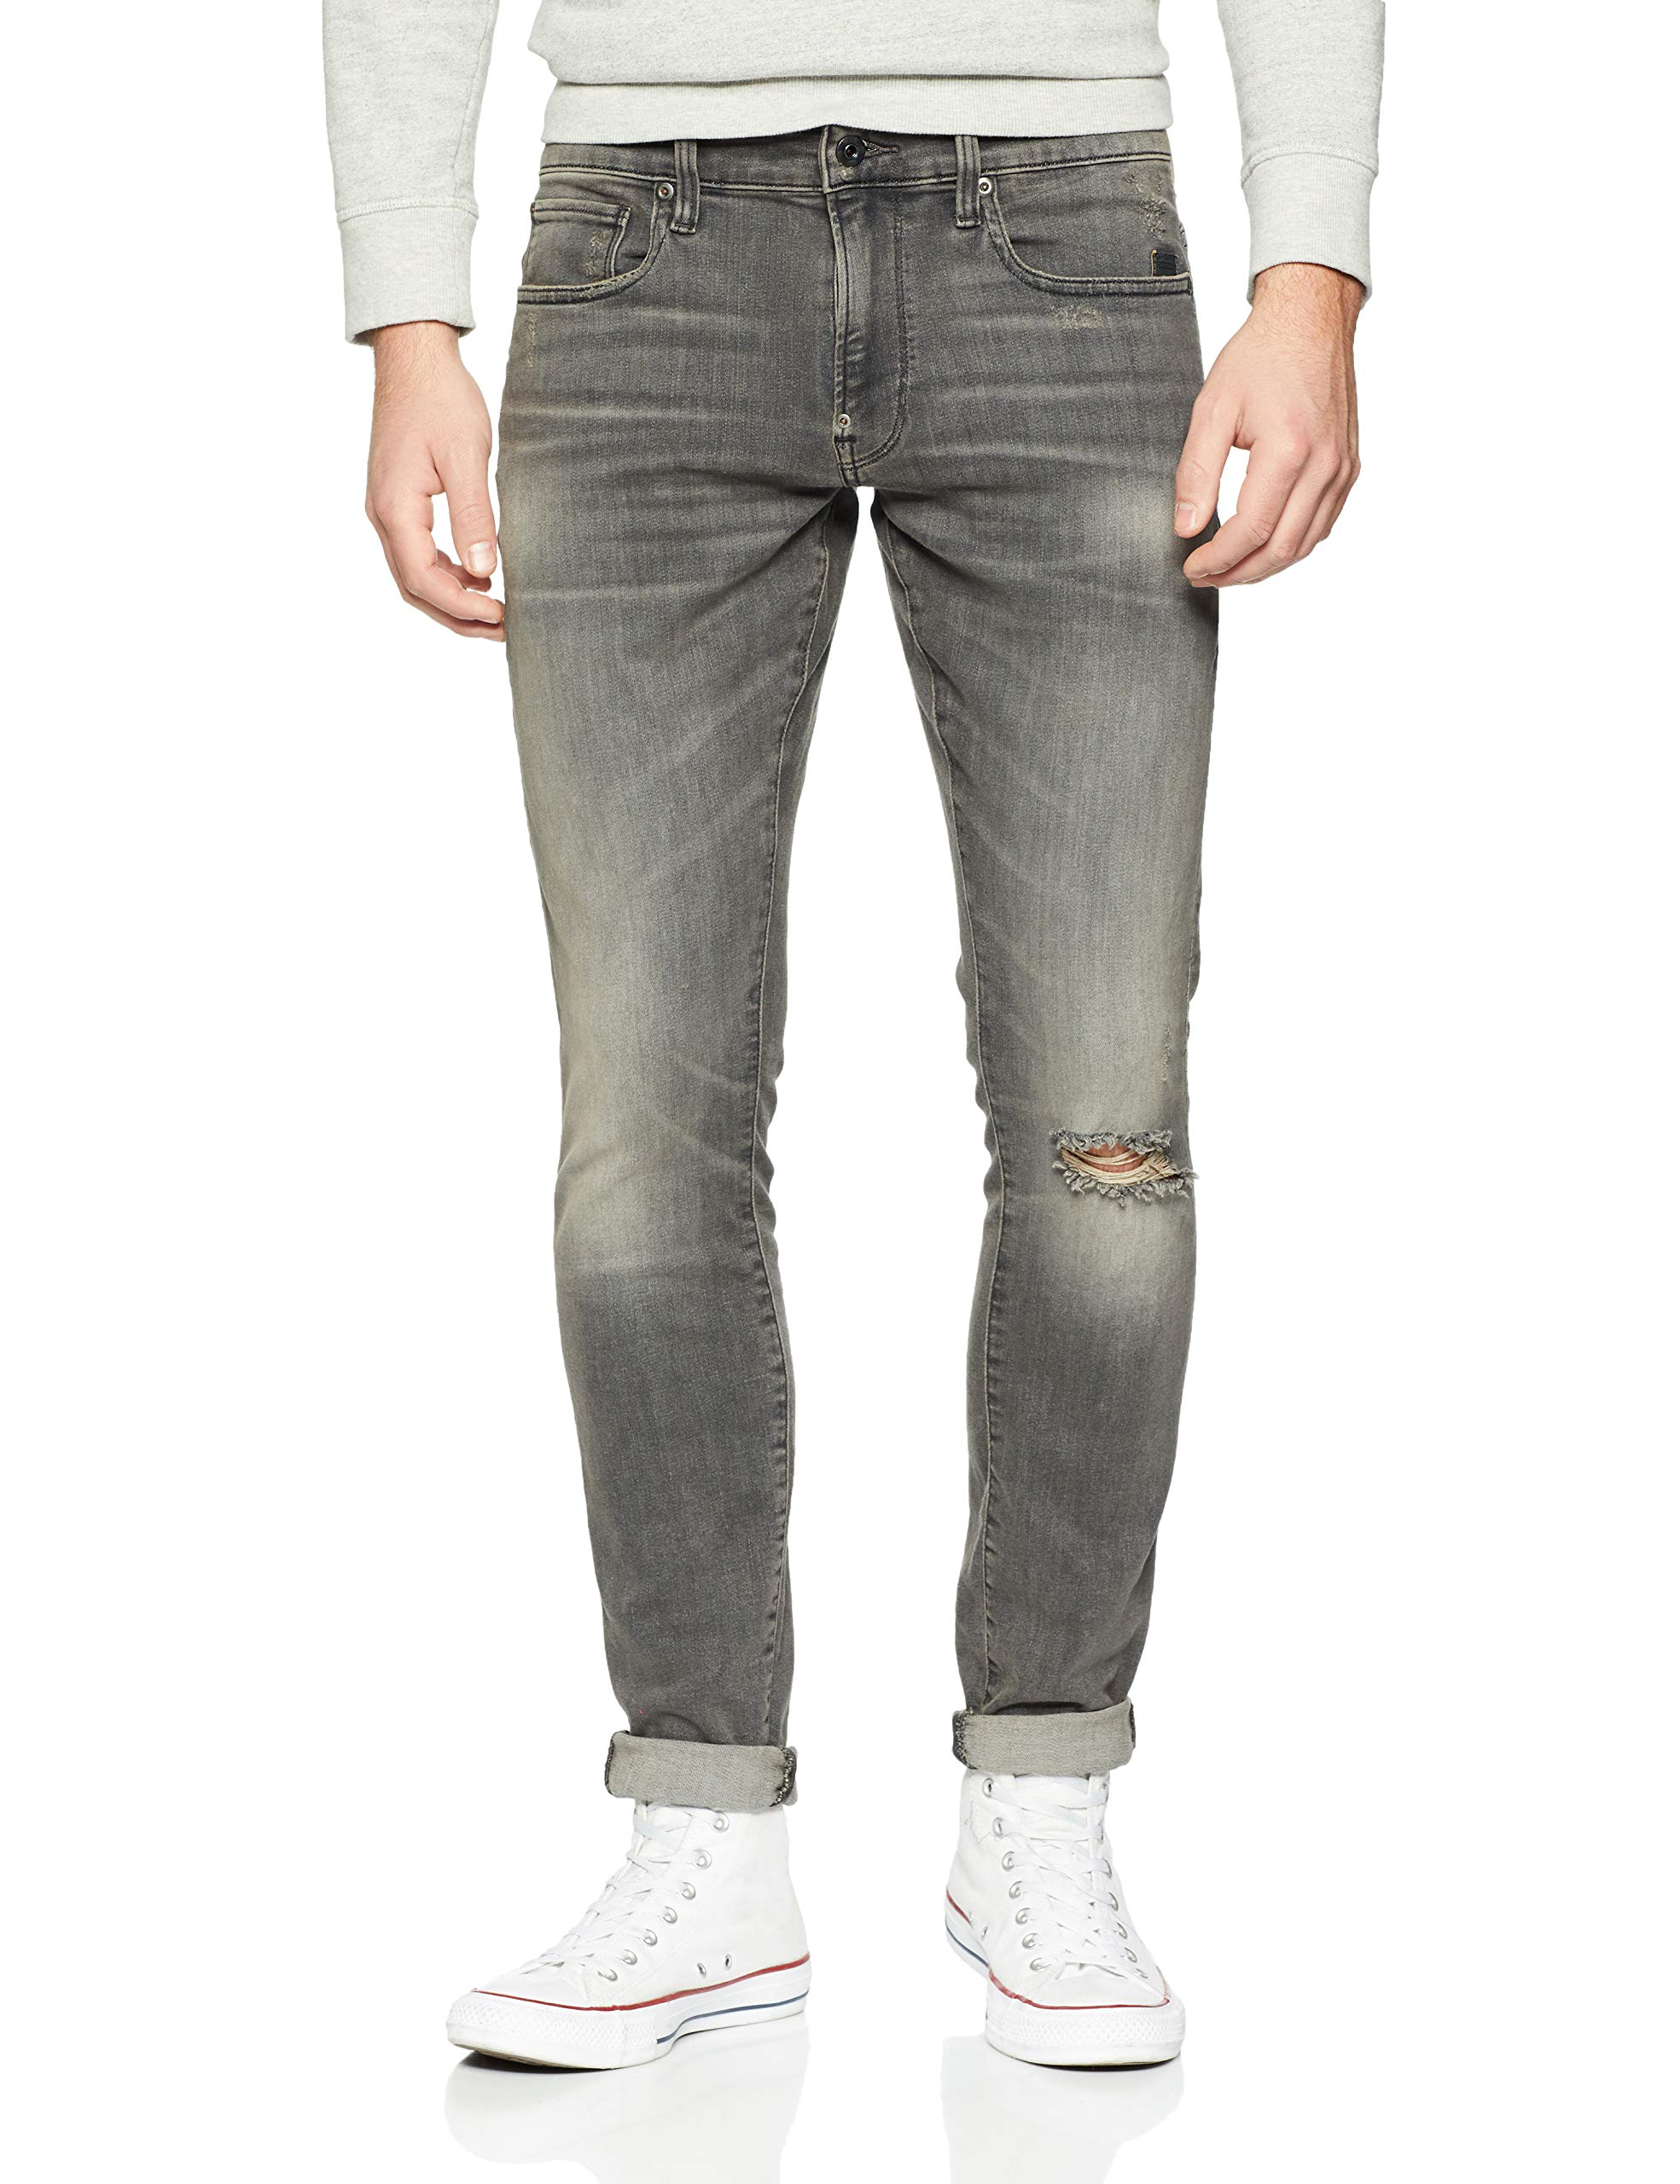 Raw Super Aged SlimJeans star Ripped G Revend l38taille HommeNoirmedium 4865W40 Fabricant40w38l A634 5ScjLR4A3q